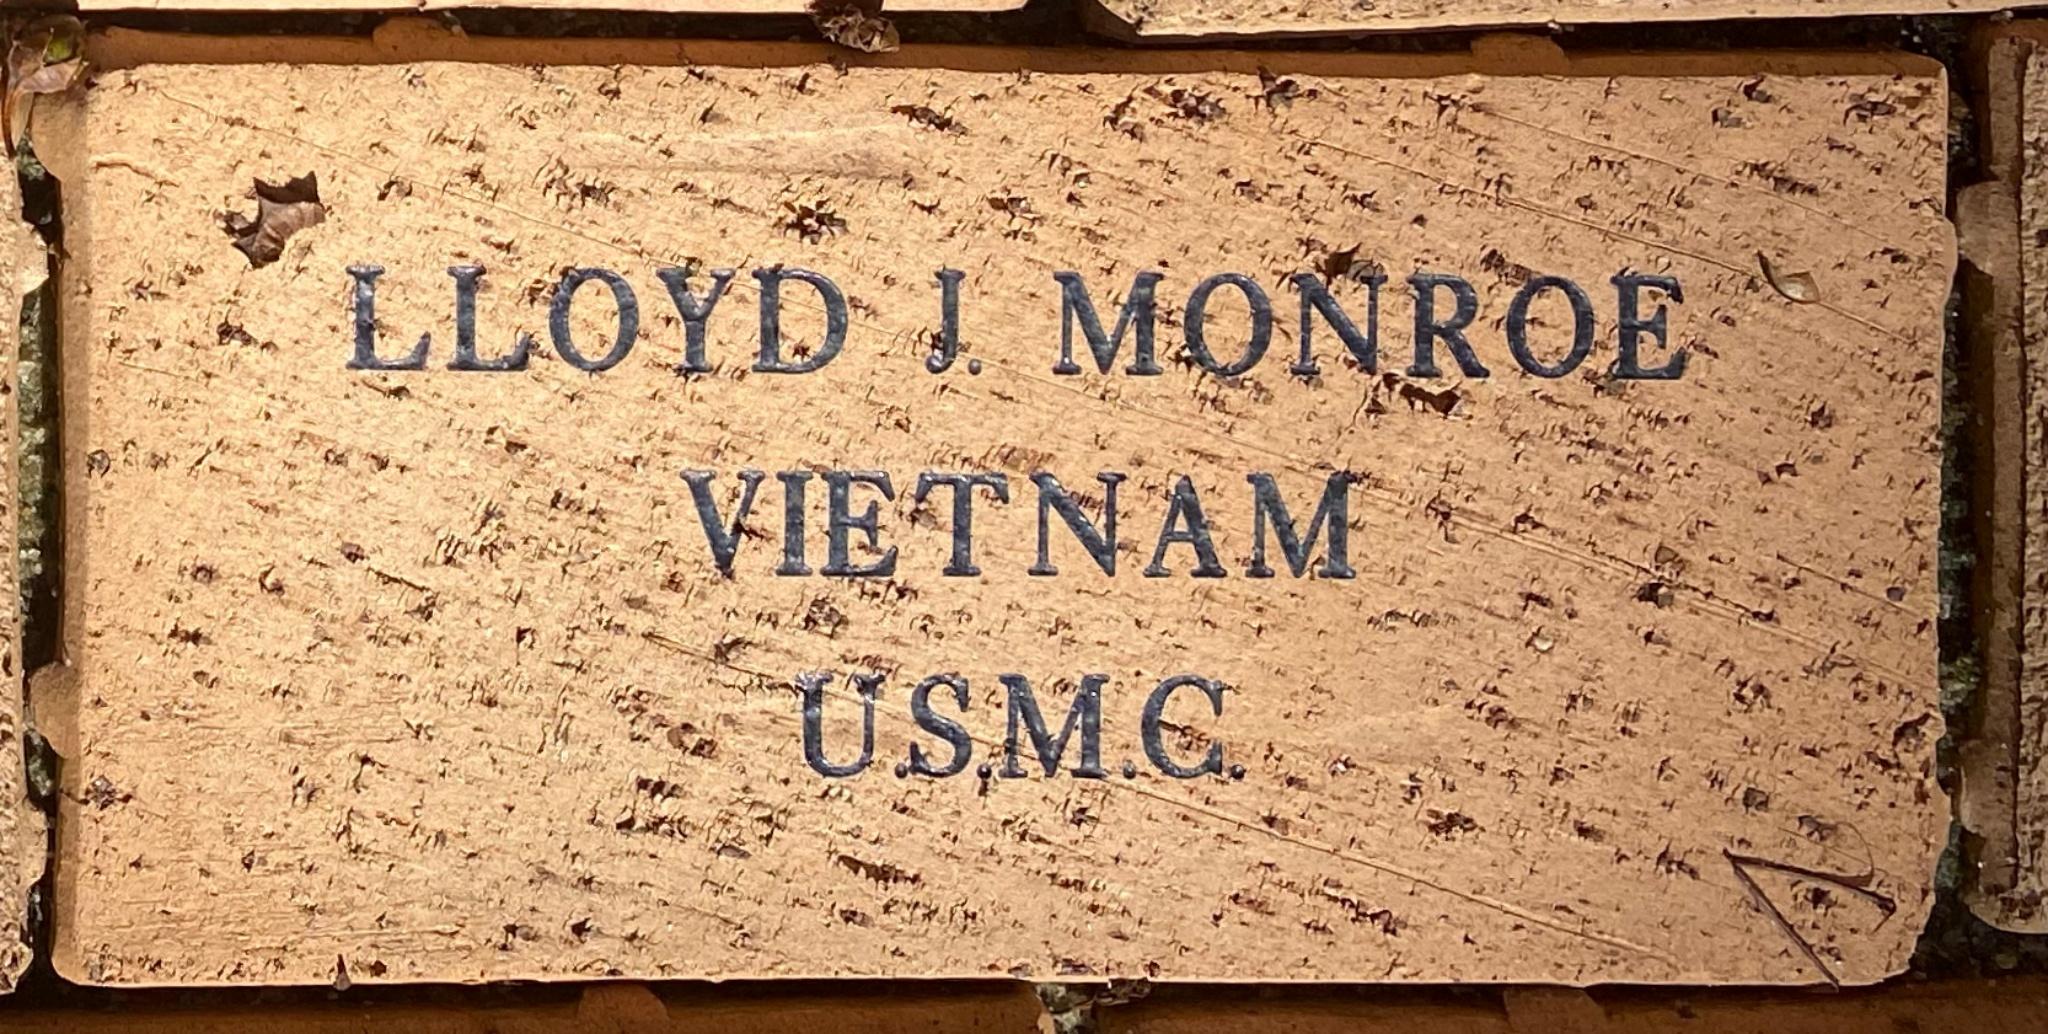 LLOYD J. MONROE VIETNAM U.S.M.C.